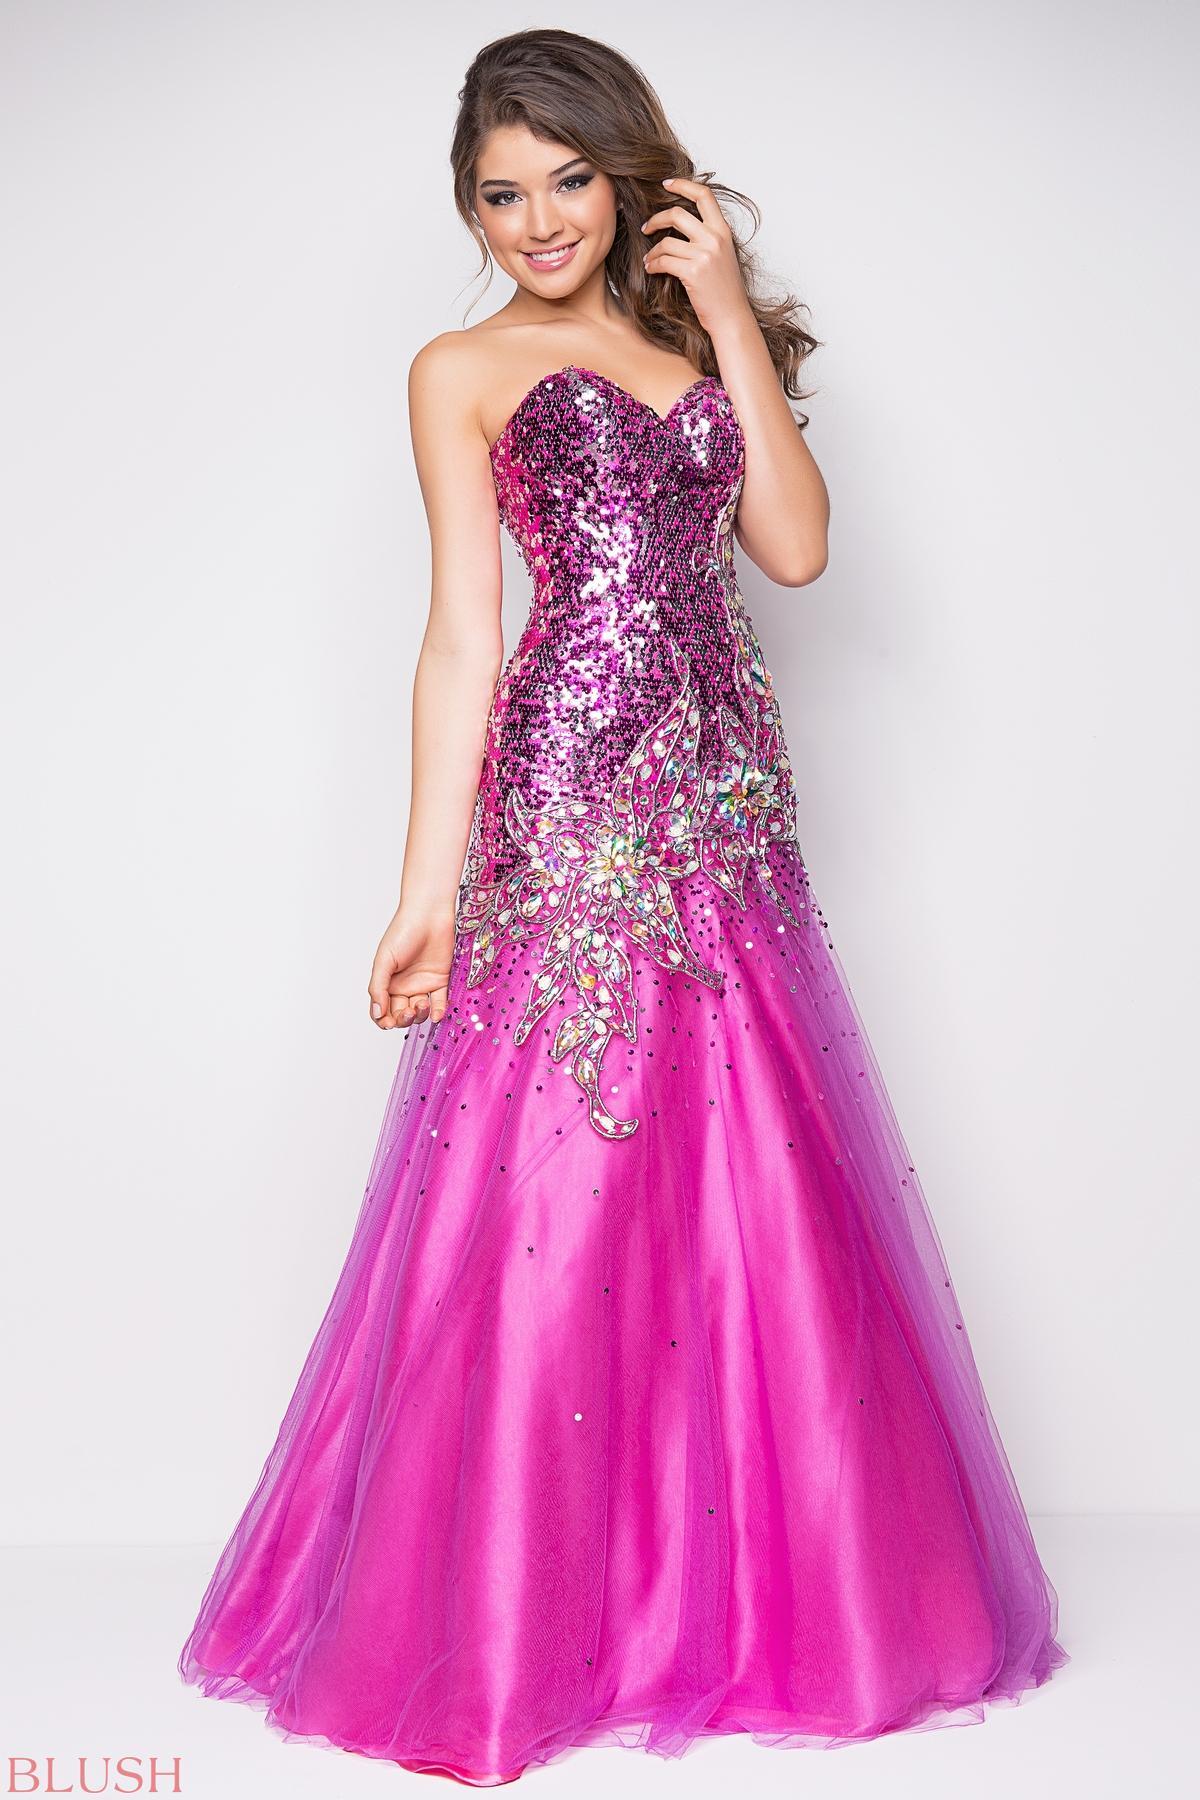 Pink Sequin Prom Dresses 2013 2013 prom dress...